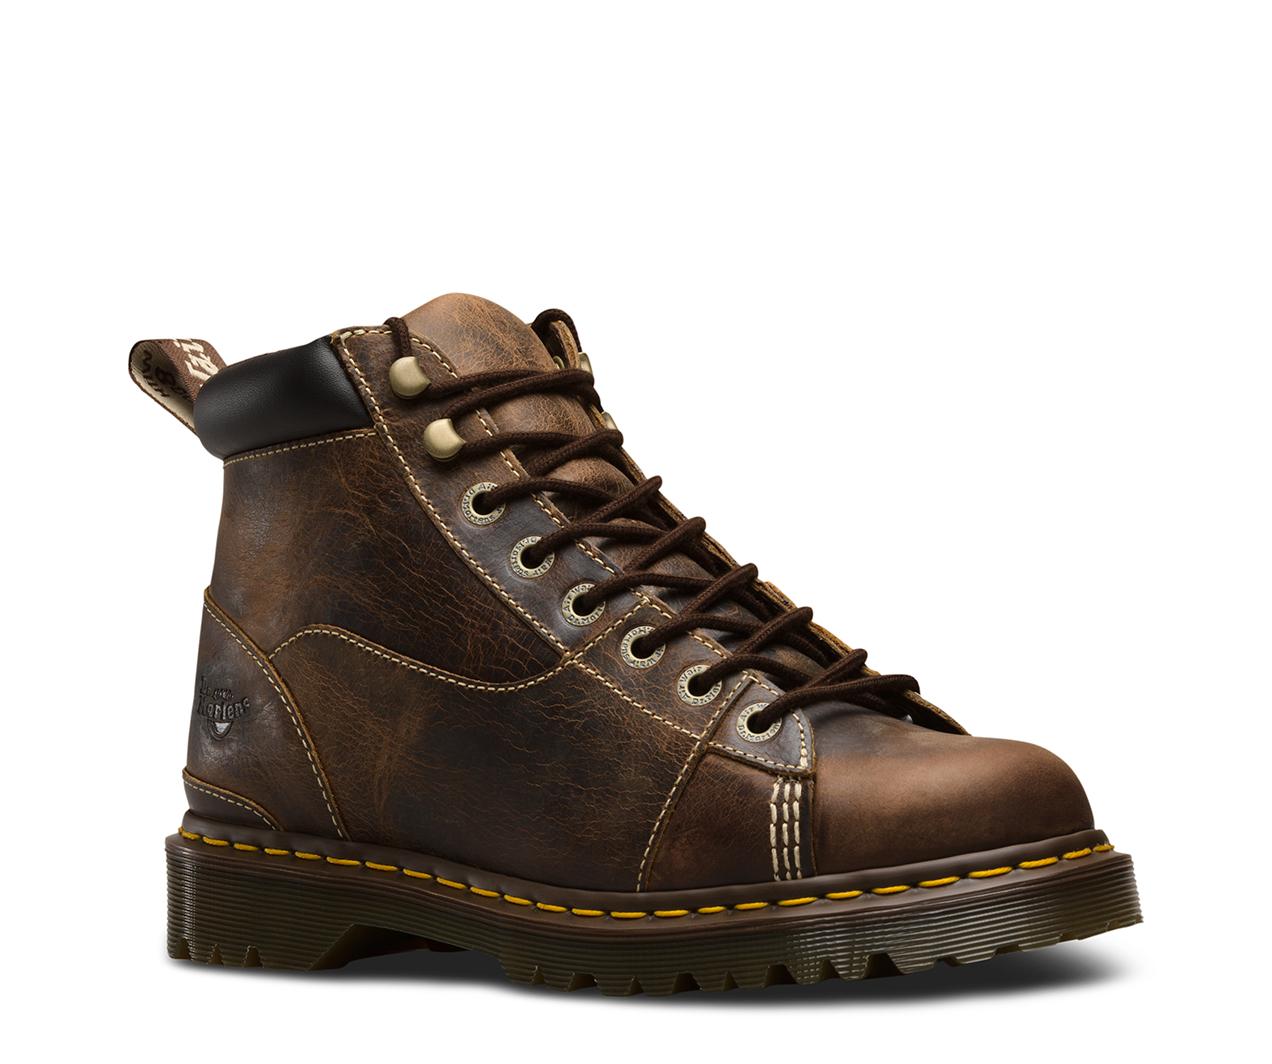 alderton new arrivals boots official dr martens store. Black Bedroom Furniture Sets. Home Design Ideas